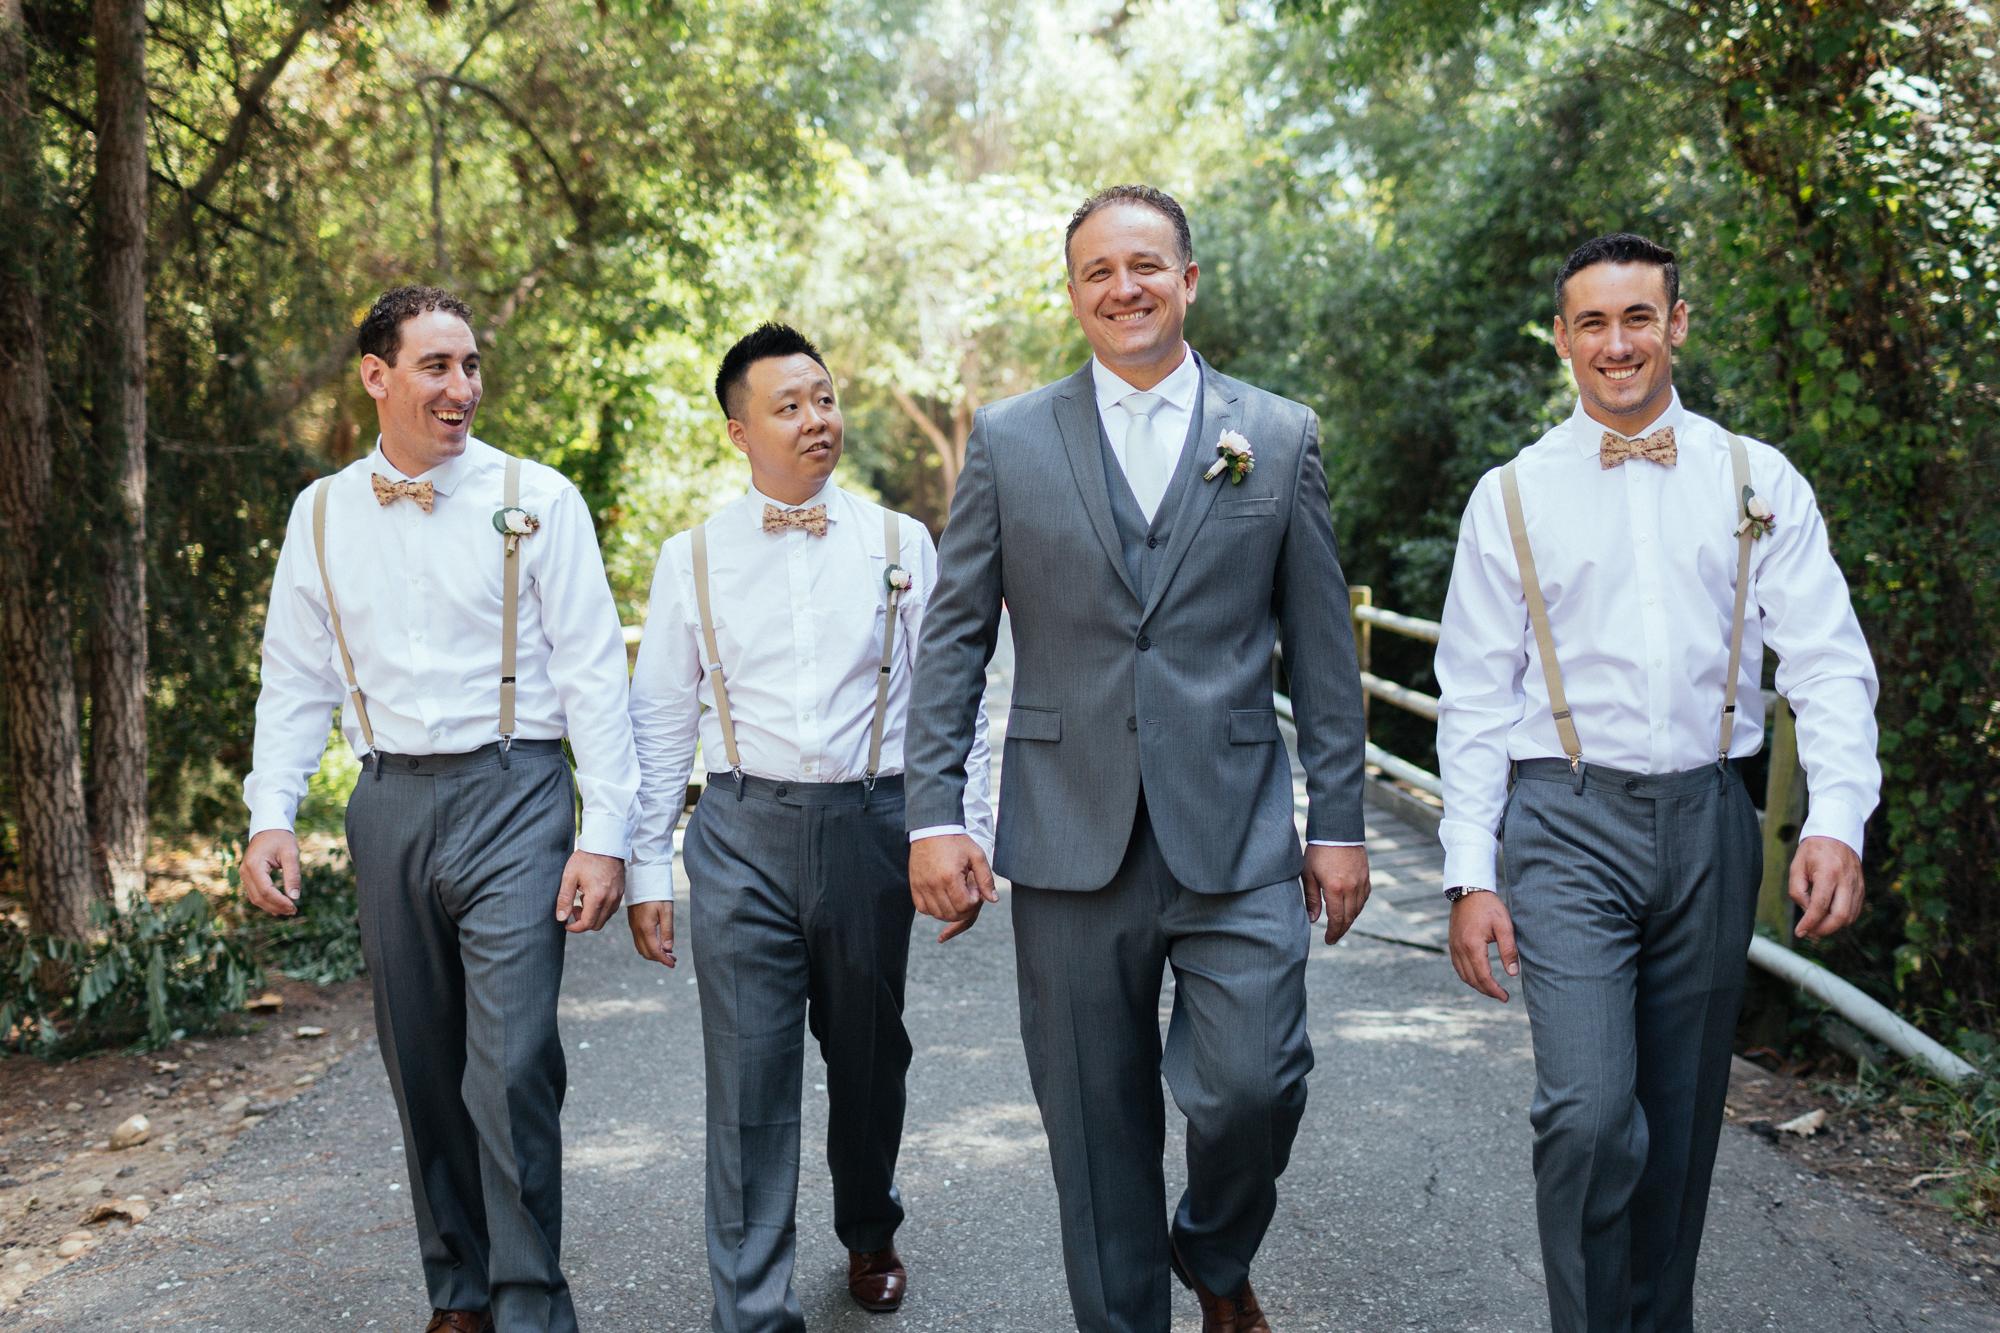 www.santabarbarawedding.com | Kaitie Brainerd Photo | Rancho Dos Pueblos | Groomsmen